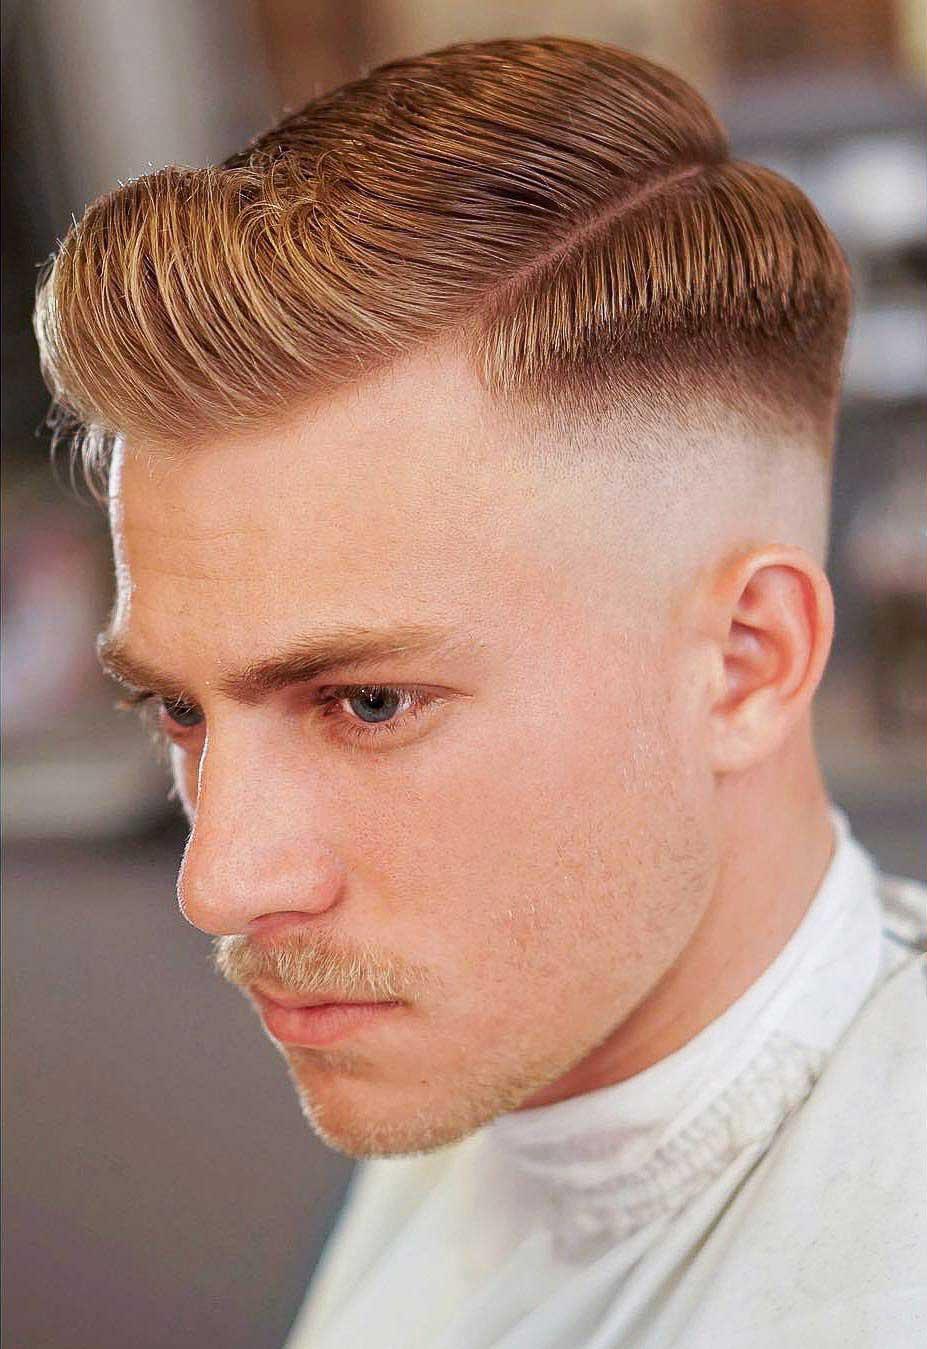 5 Potongan Rambut Pria Undercut Yang Siap Menunjang Penampilanmu